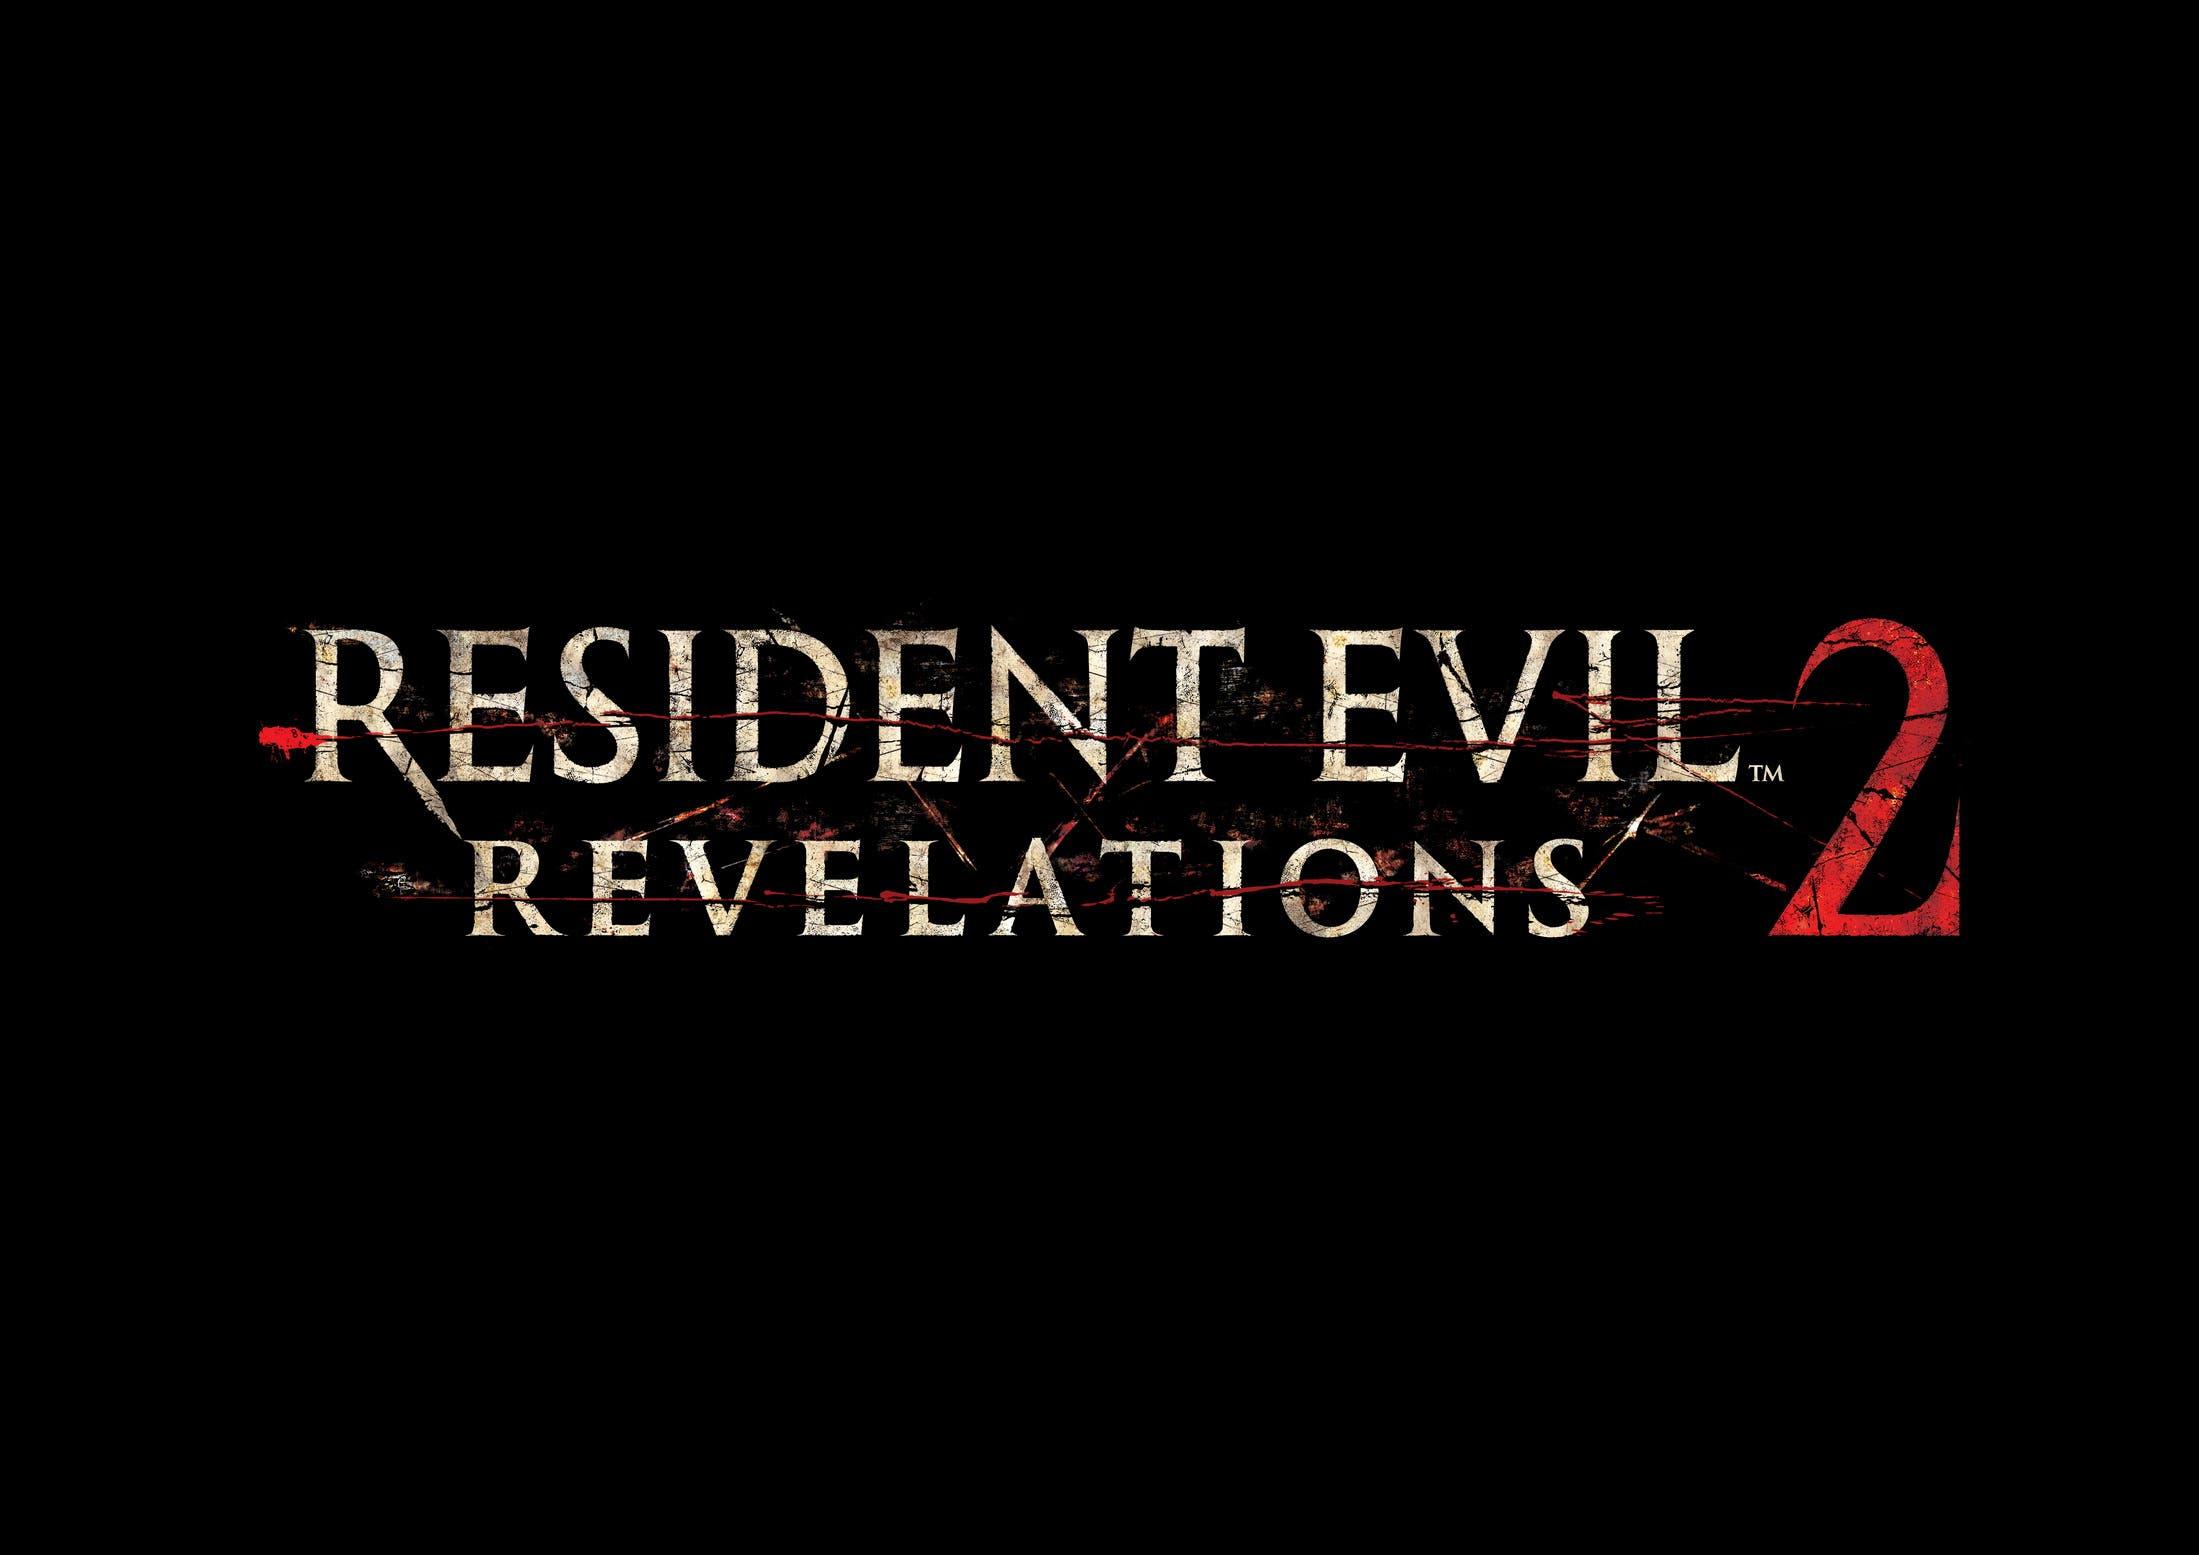 Resident Evil Revelations 2 Deluxe Edition se estrena en Xbox Live con una gran oferta 15